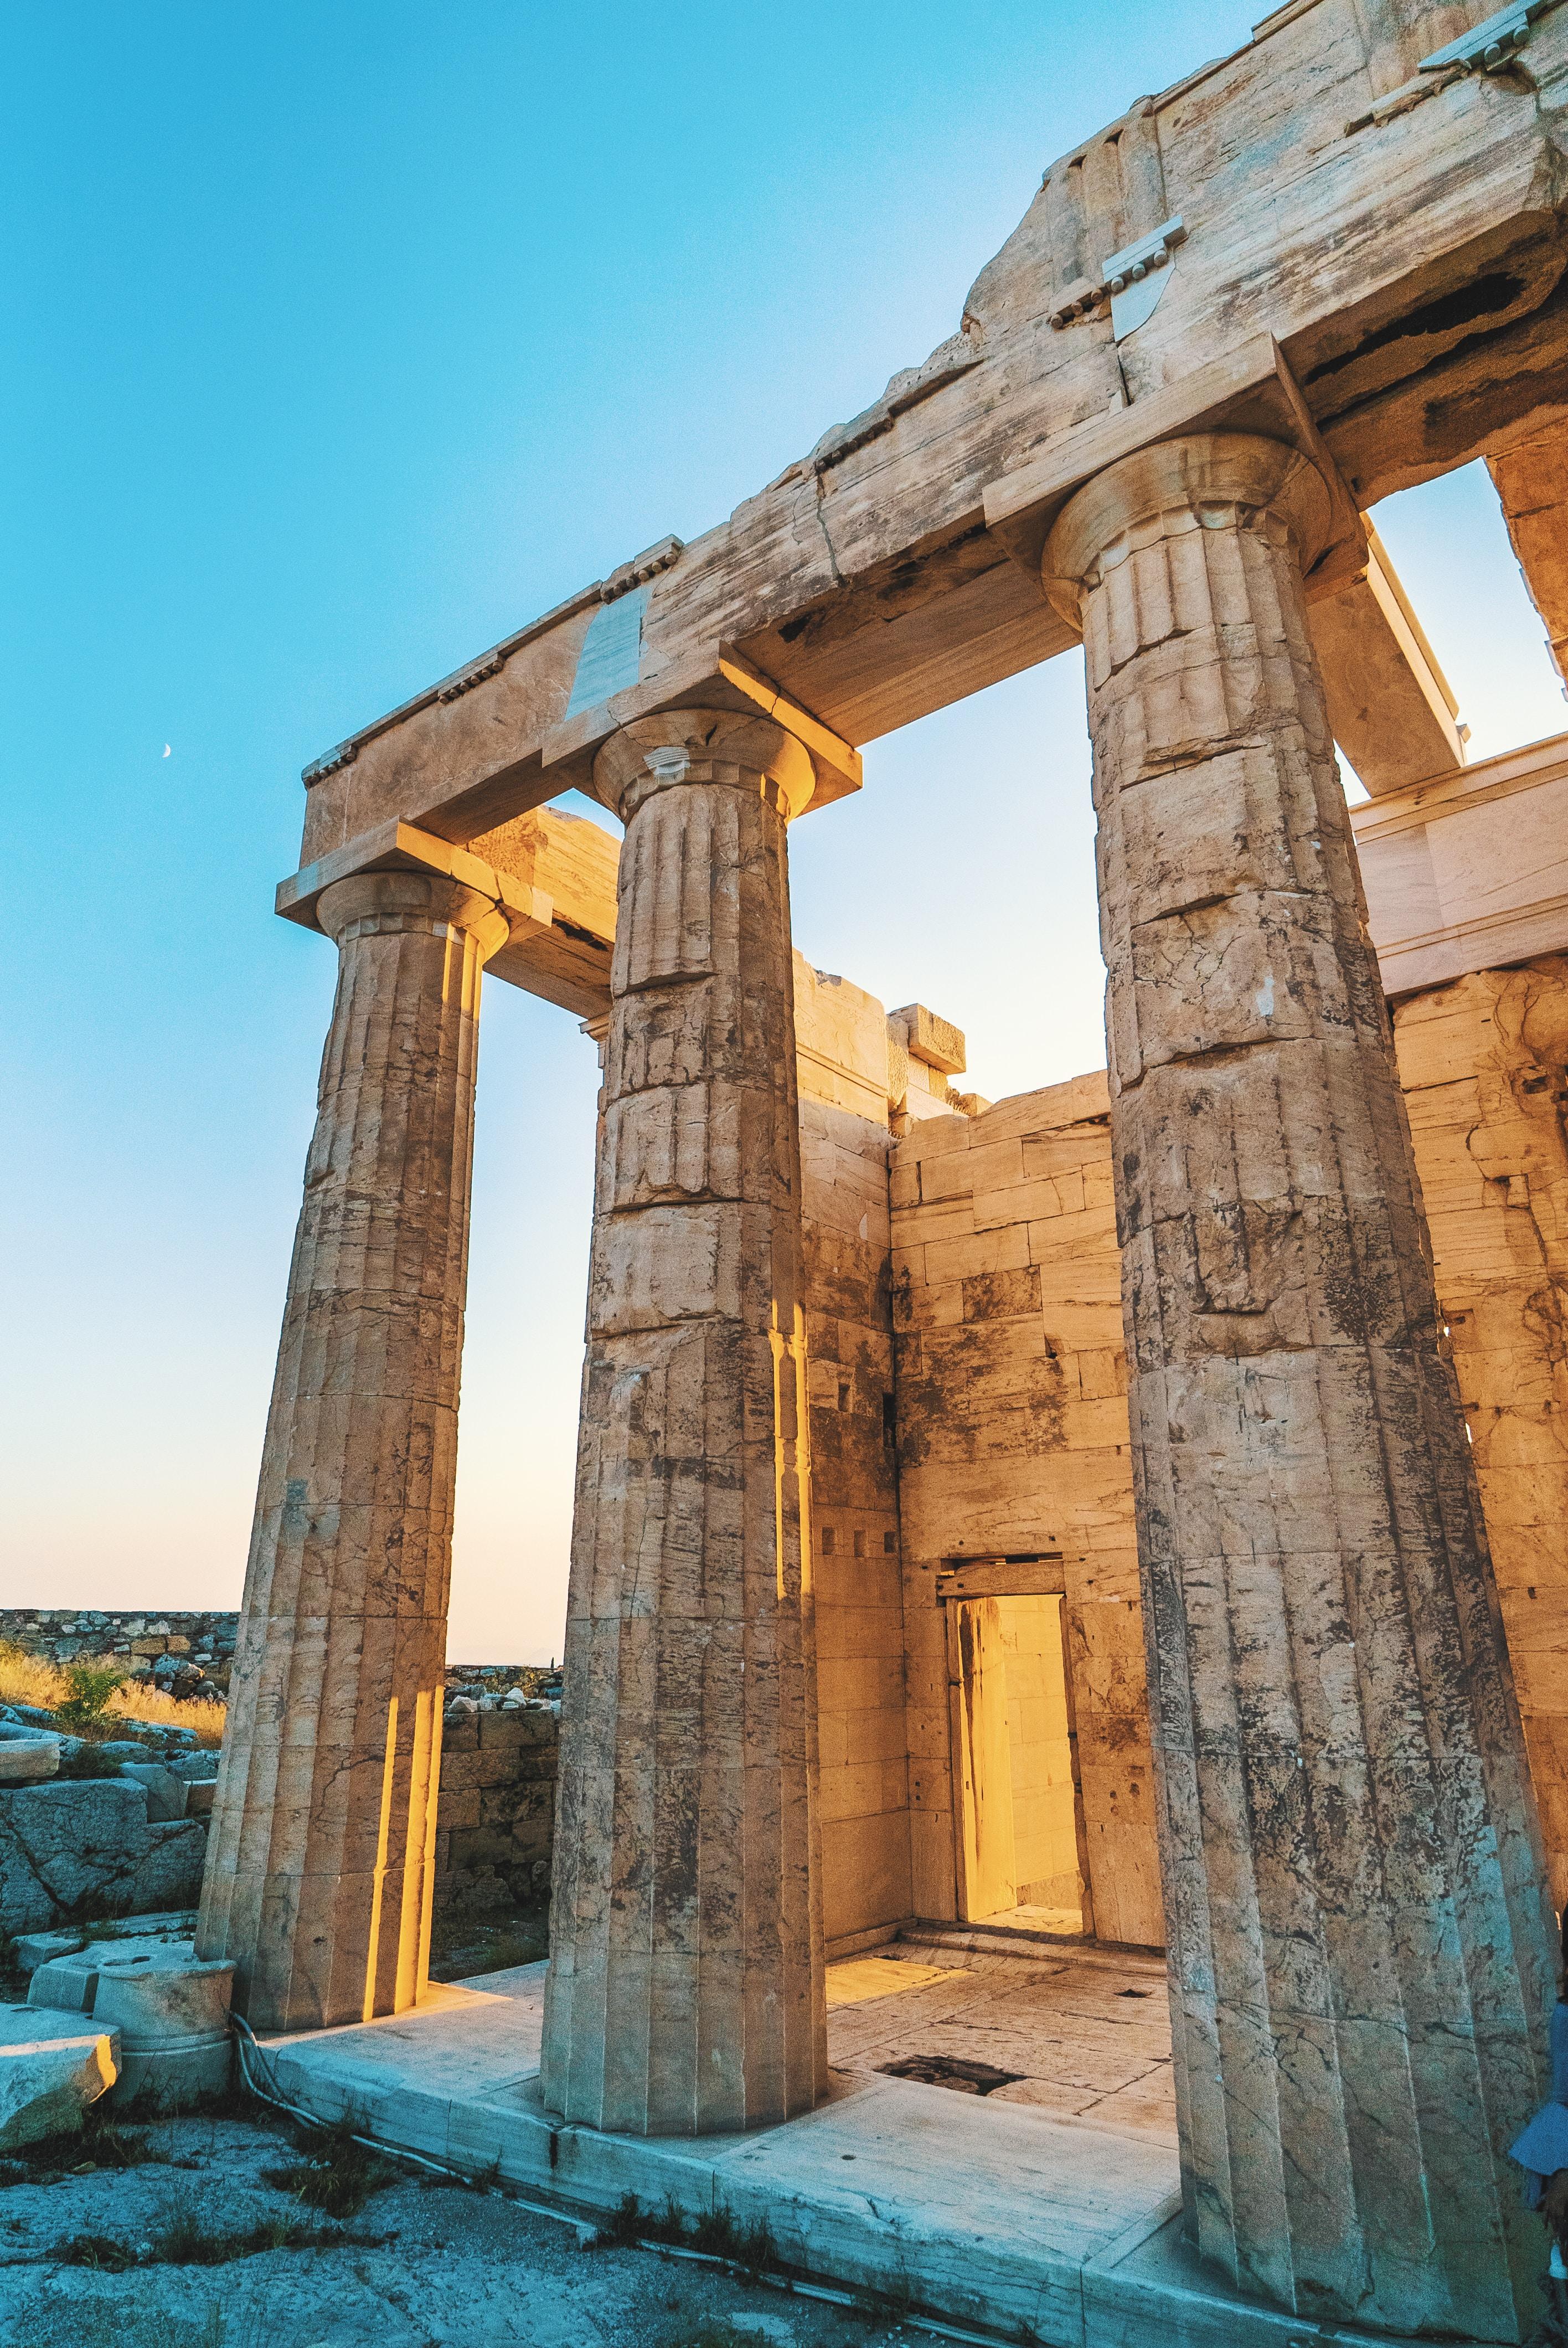 column ruins during daytime